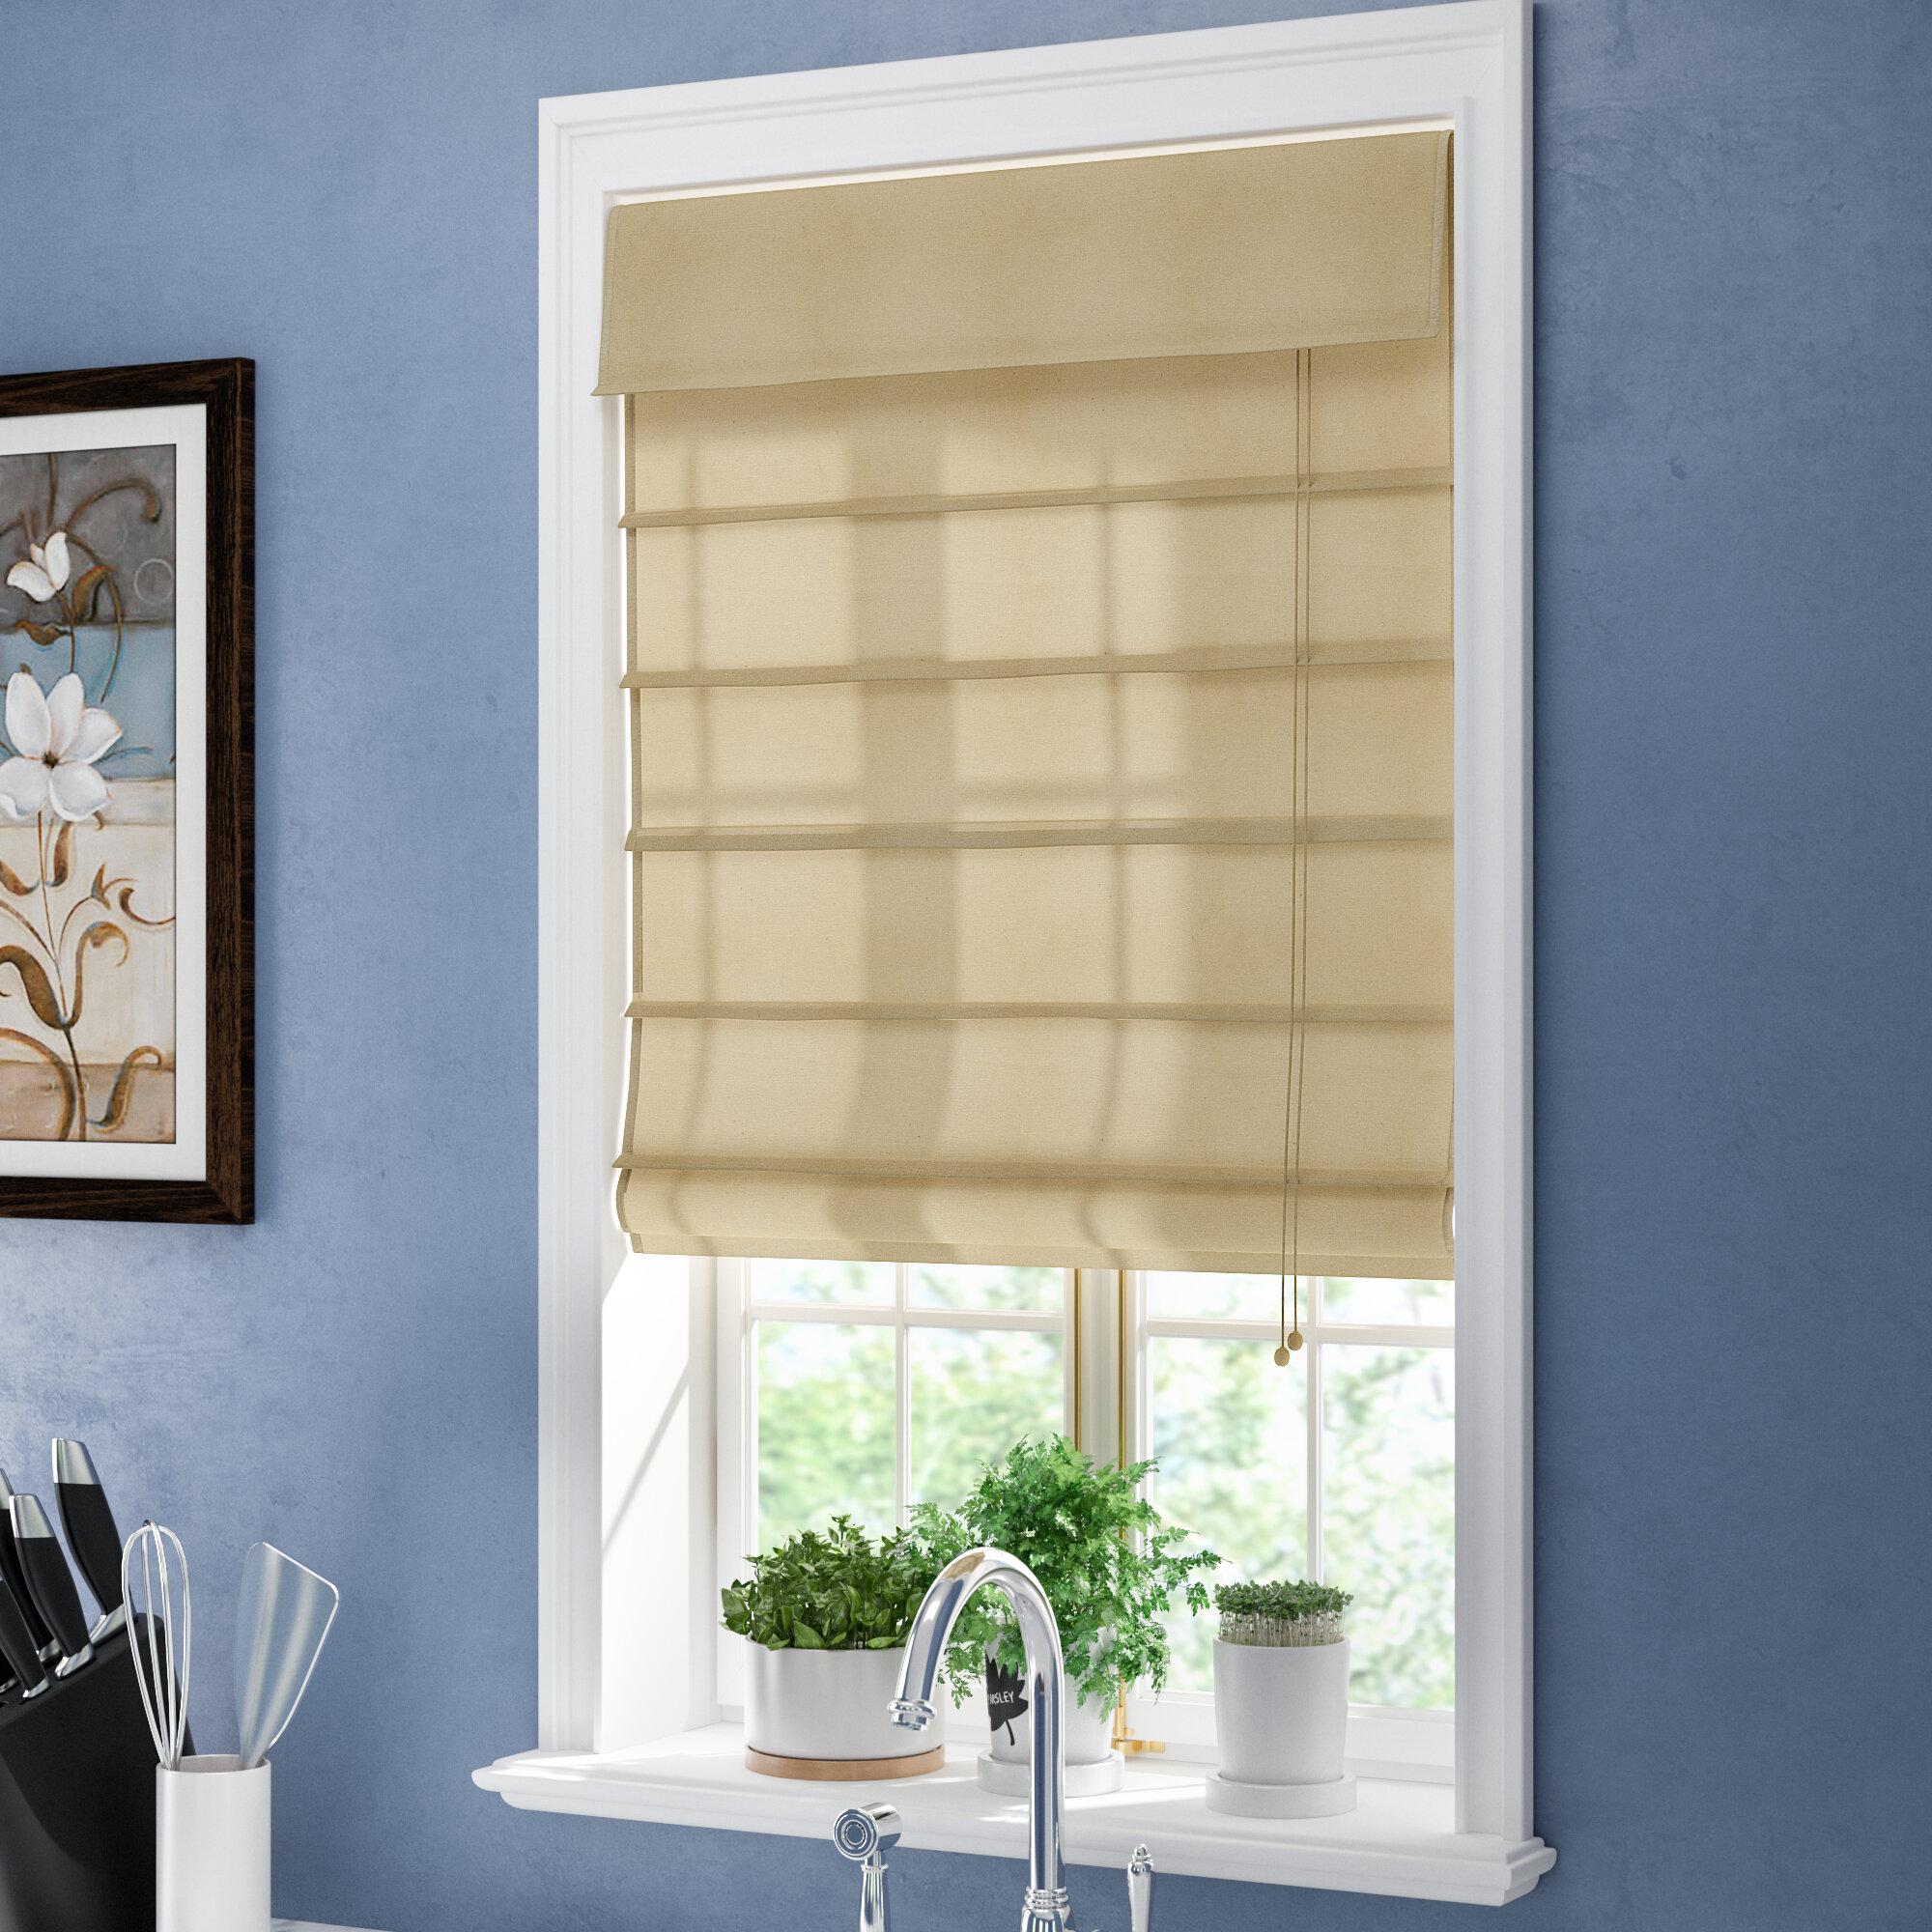 palisades laminatedroller shutter shades roman company valance bedroom shade